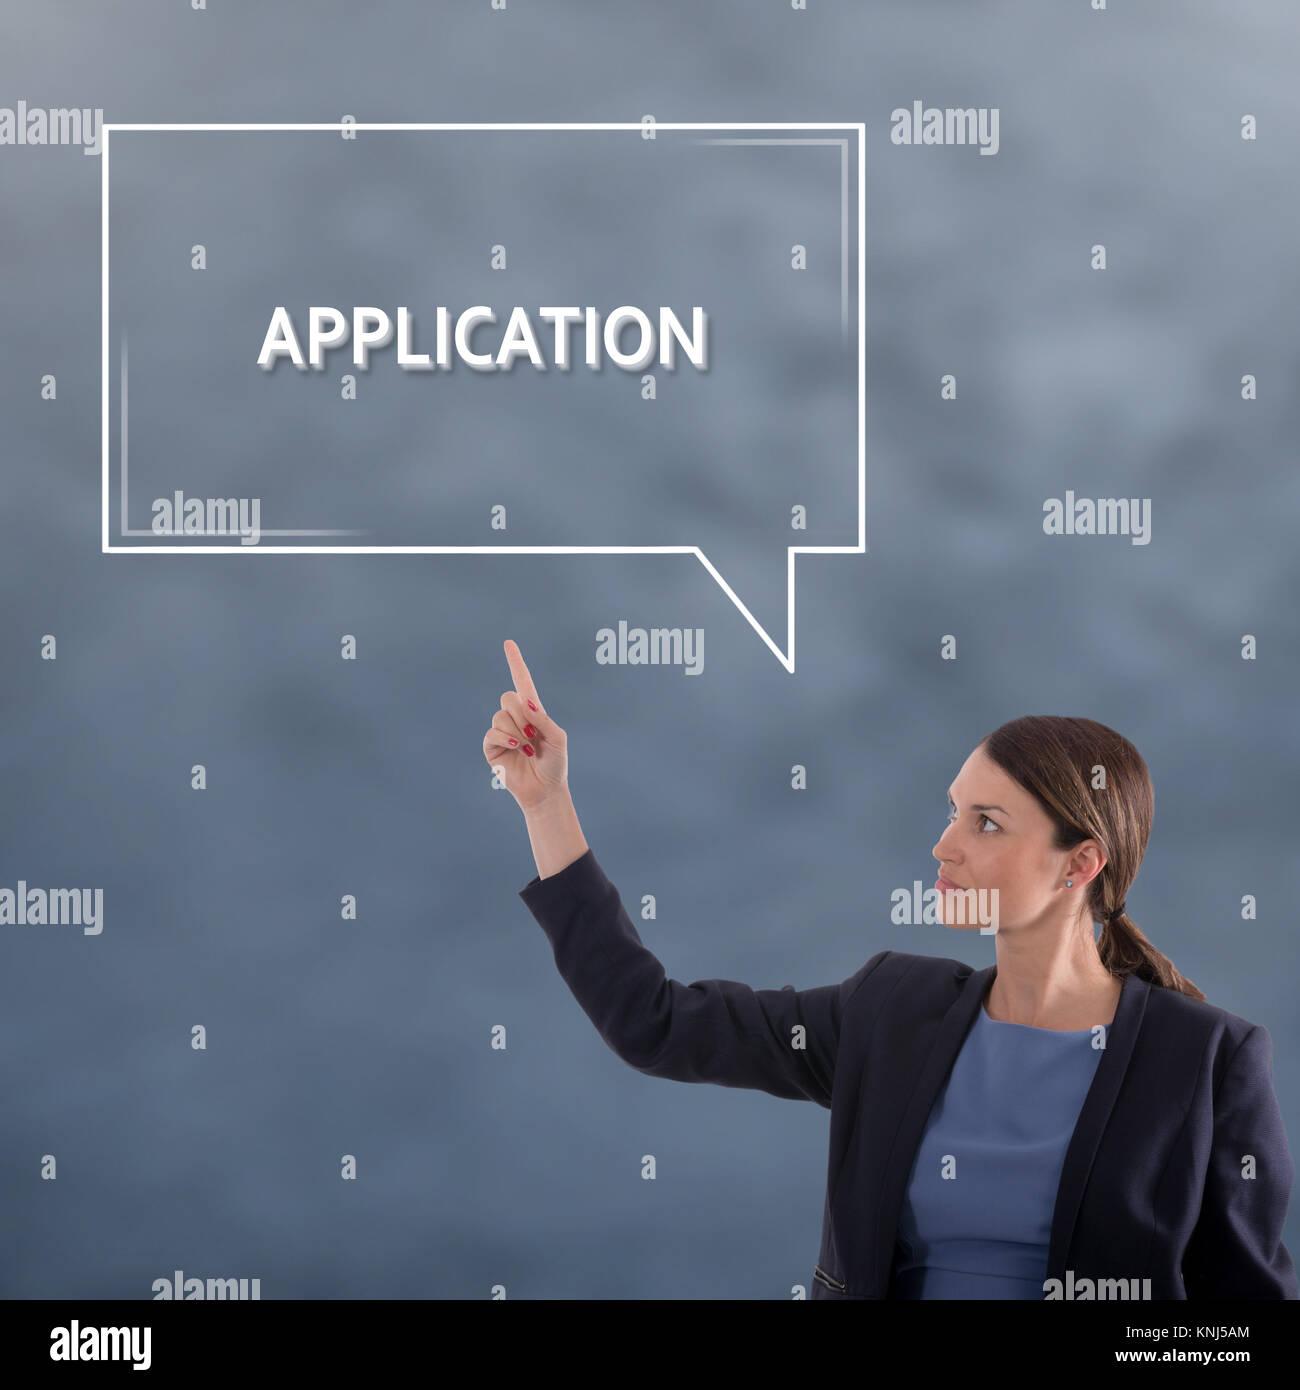 APPLICATION CONCEPT Business Concept. Business Woman Graphic Concept - Stock Image